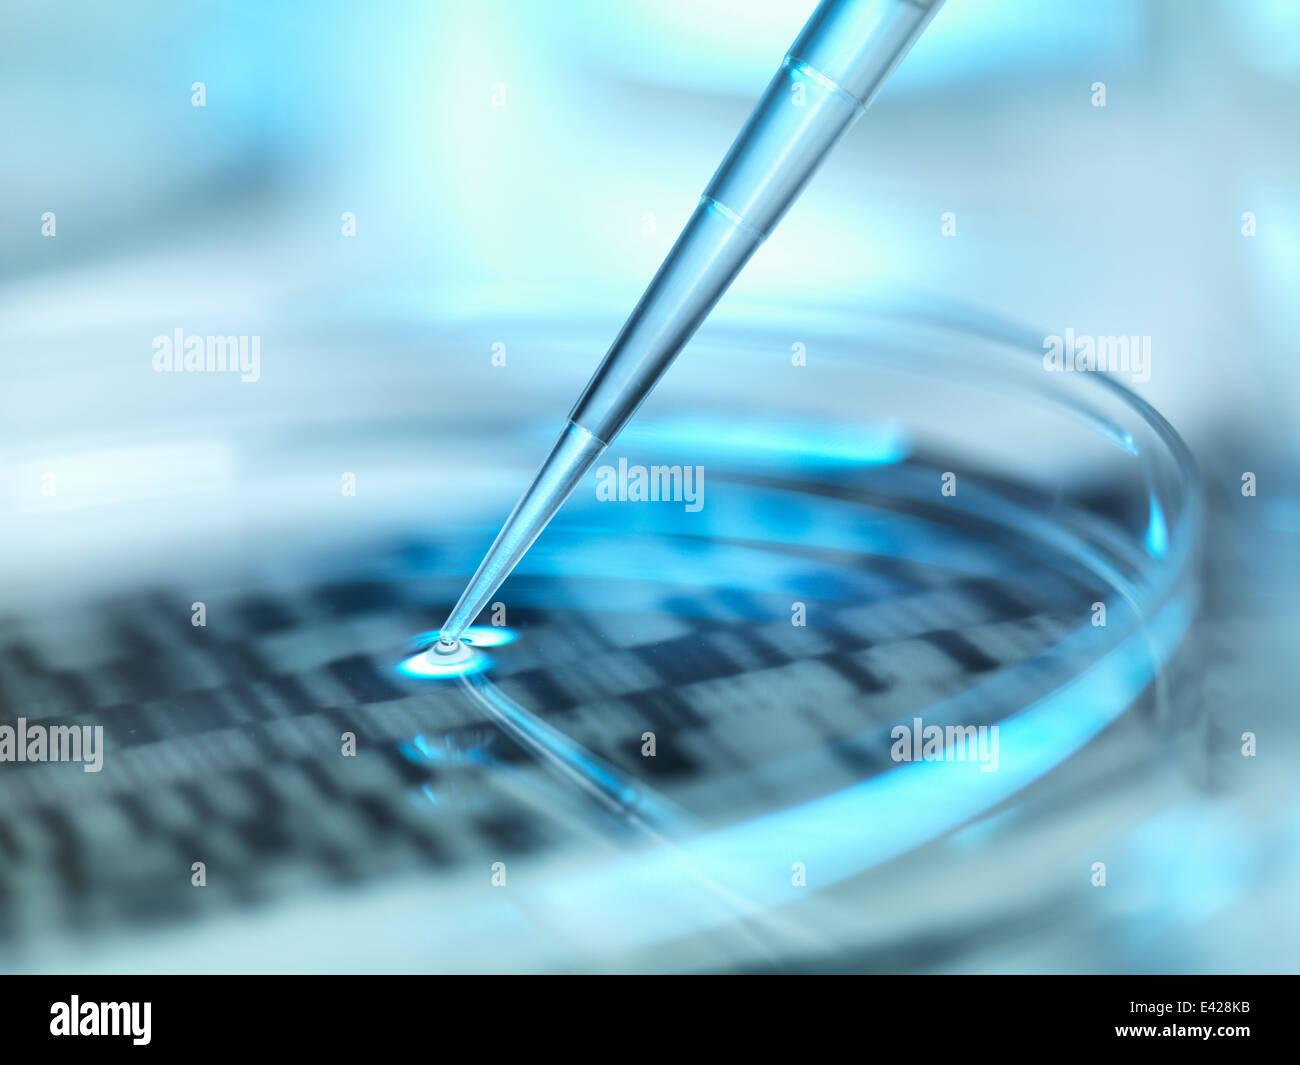 DNA (deoxyribonucleic acid) autoradiogram in a petri dish - Stock Image